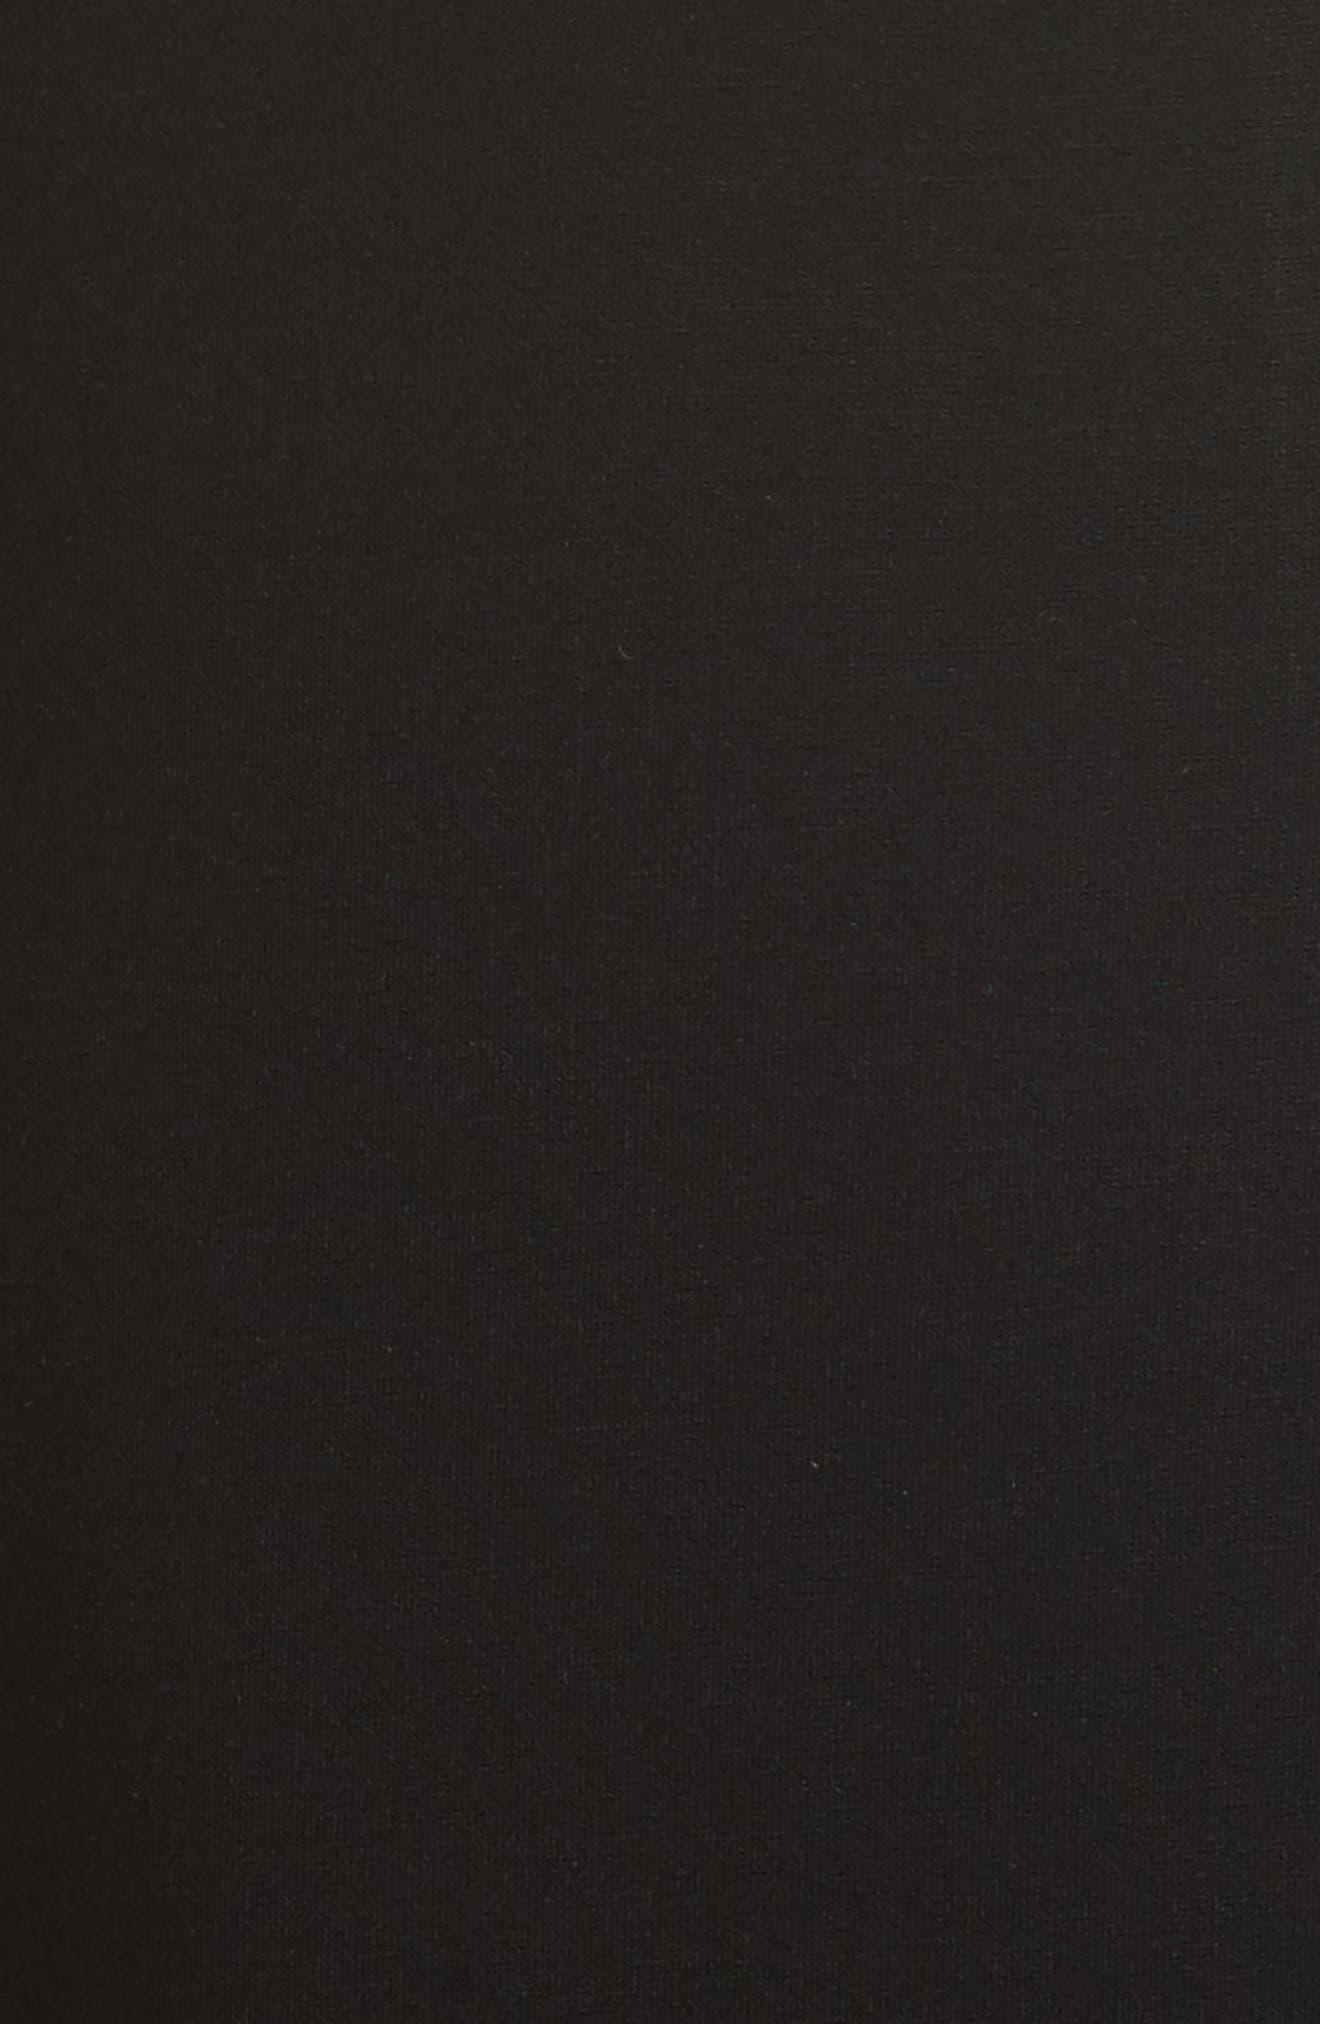 Jessa Cutout Midi Dress,                             Alternate thumbnail 5, color,                             001